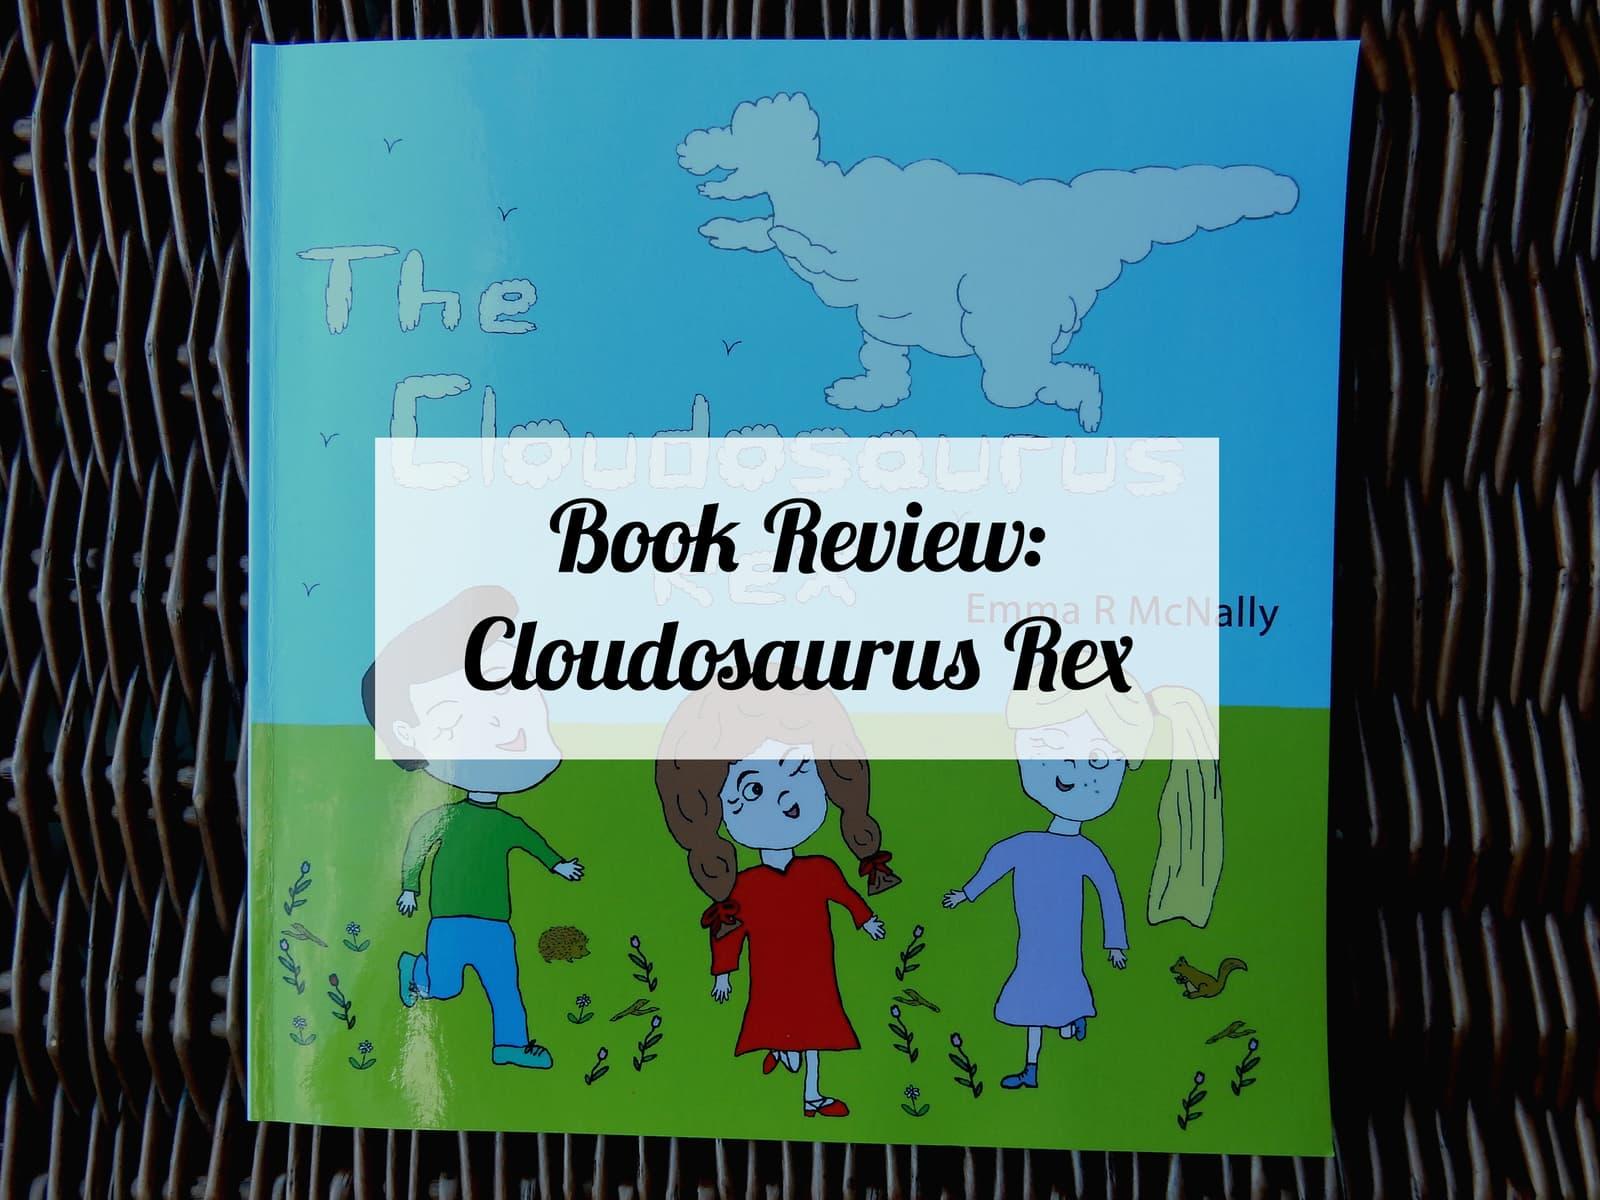 Review: Cloudosaurus Rex